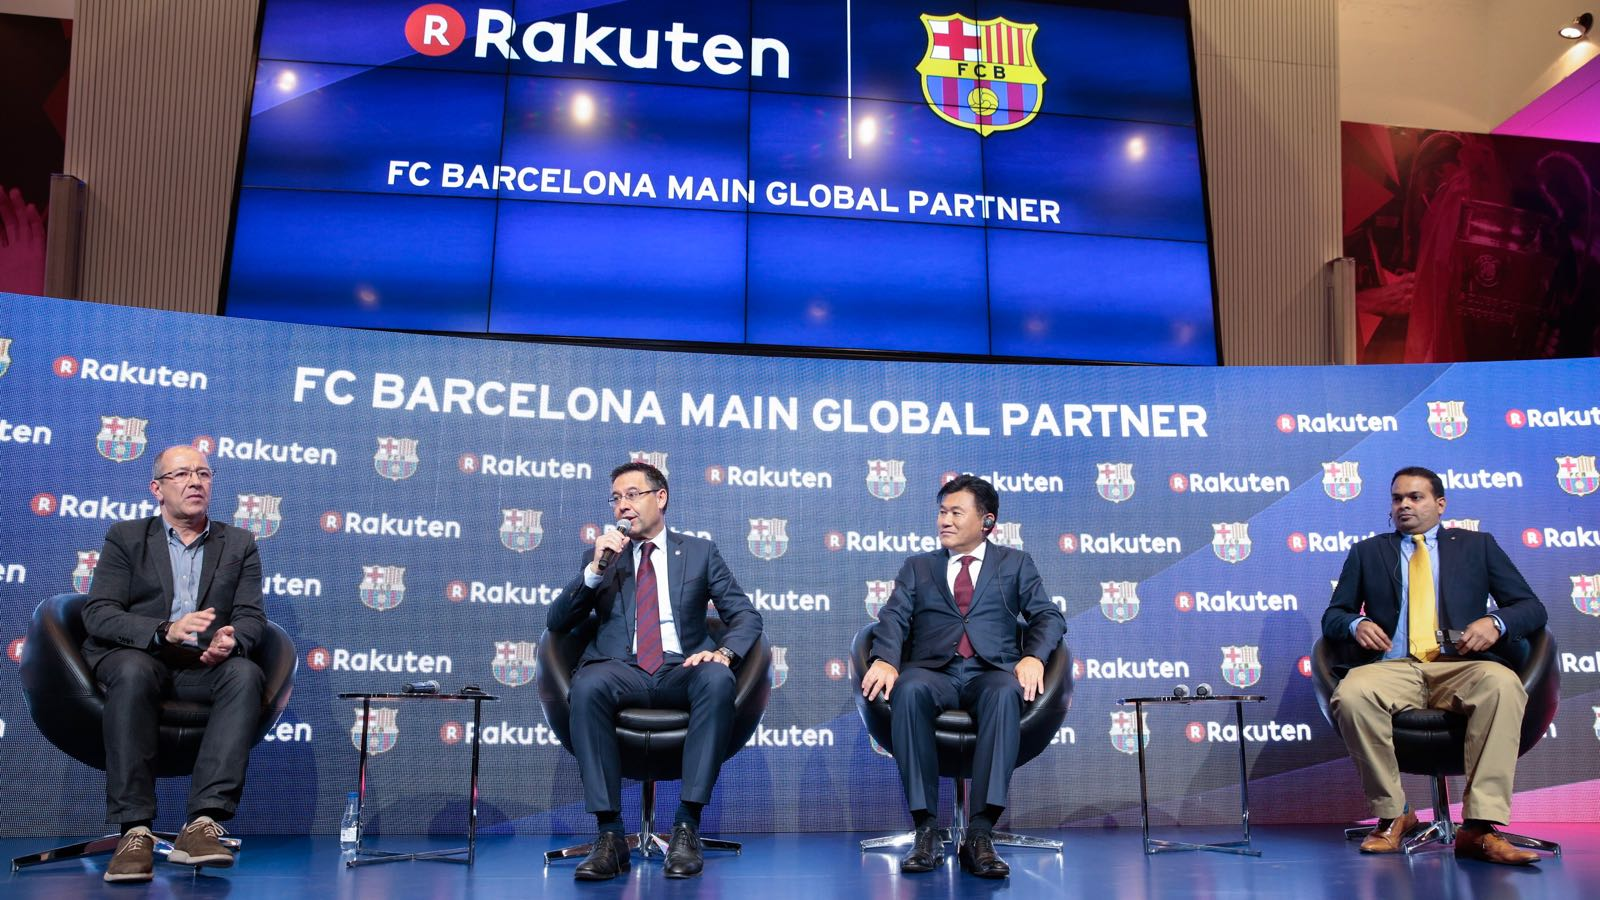 How Rakuten is leveraging sports partnerships to transition to a 'superbrand': Marketing Q&A with Rahul Kadavakolu